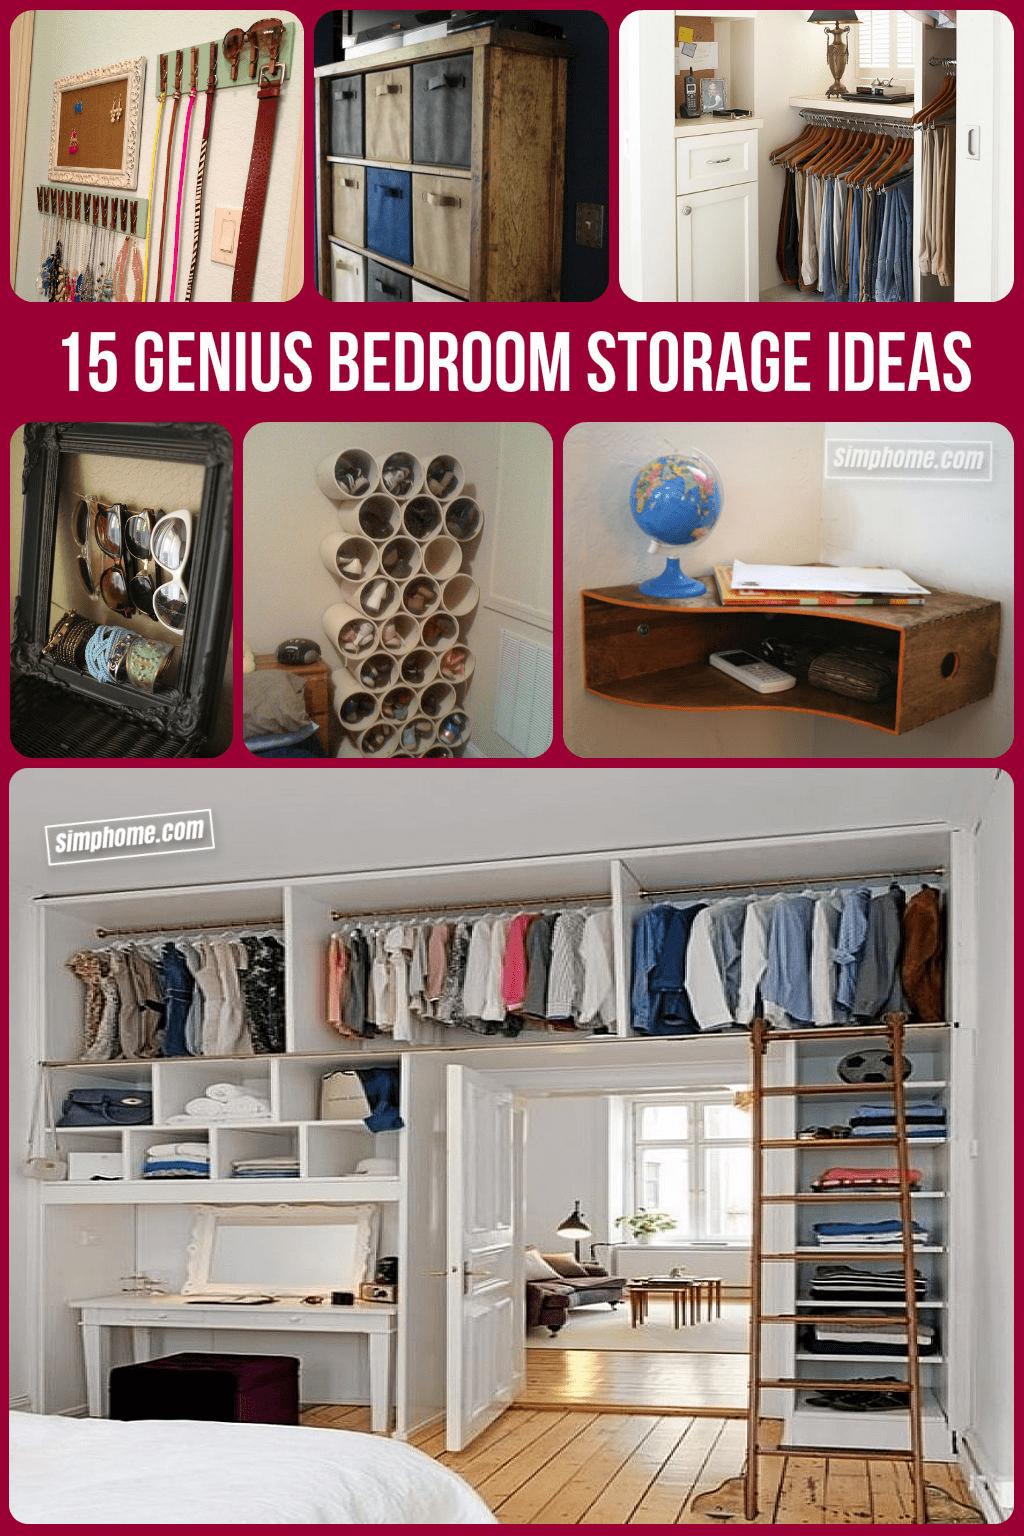 Simphome.com Clever Bedroom Storage Ideas